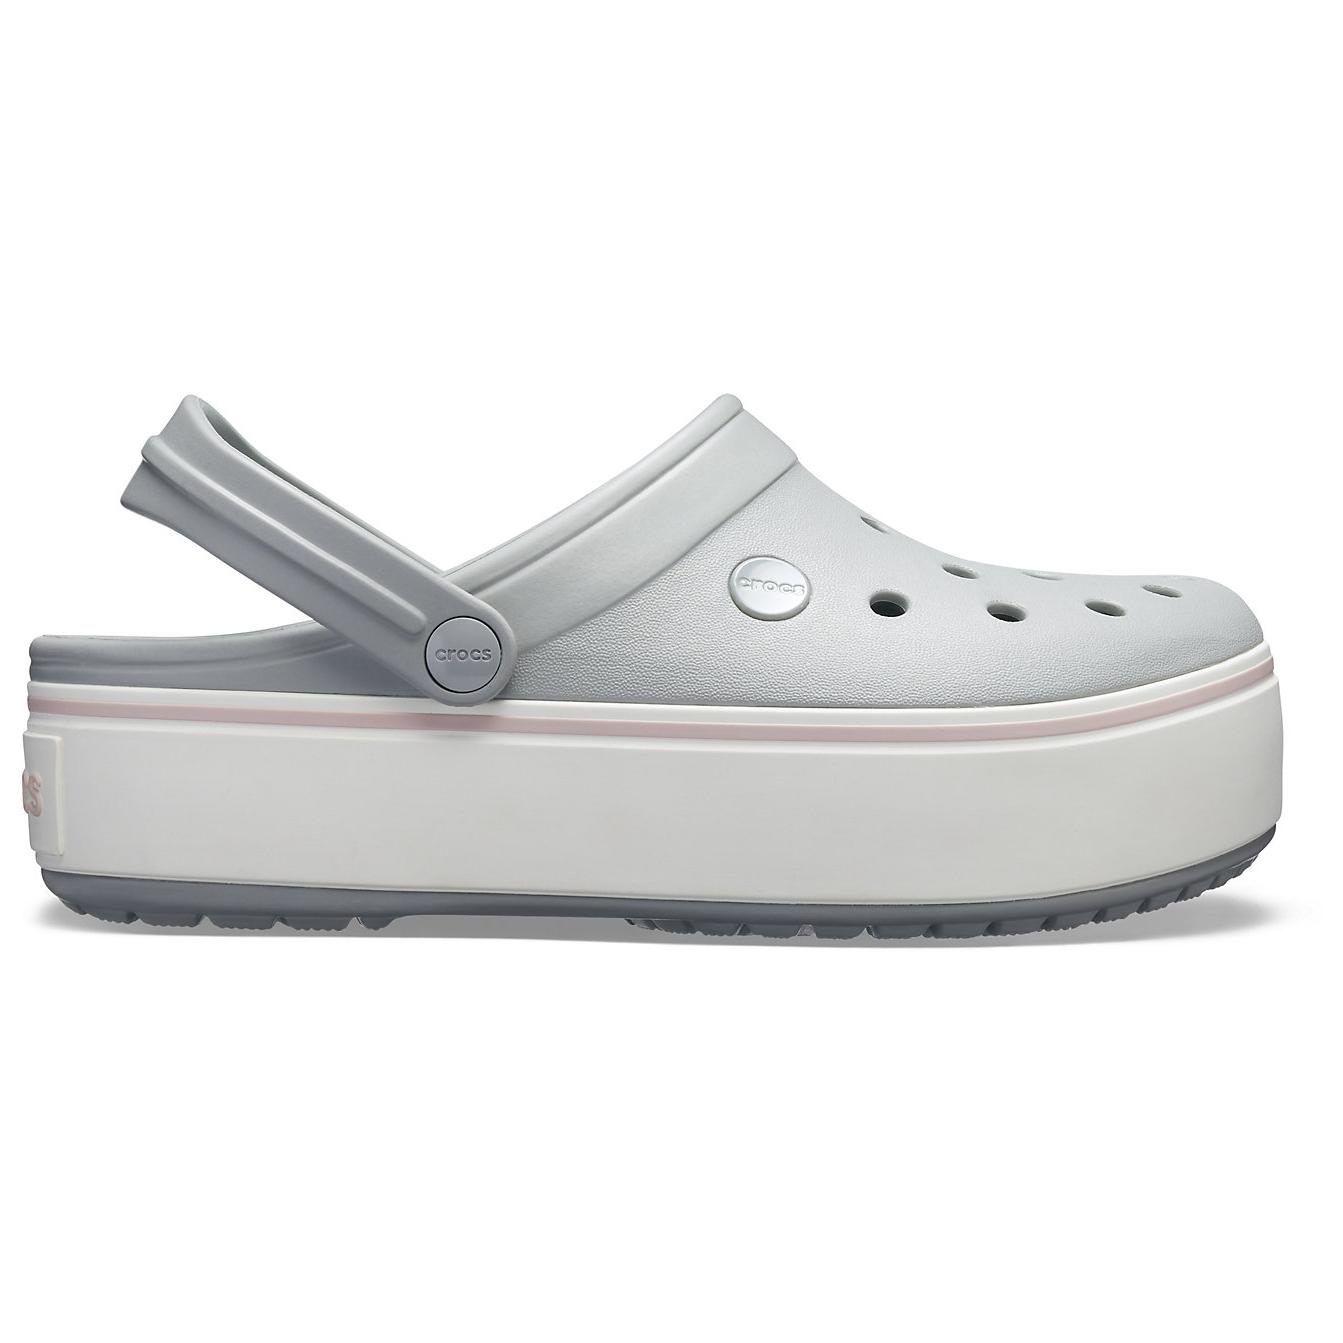 069c1736a06 Crocs Crocband Platform Clog - Sandals Women s